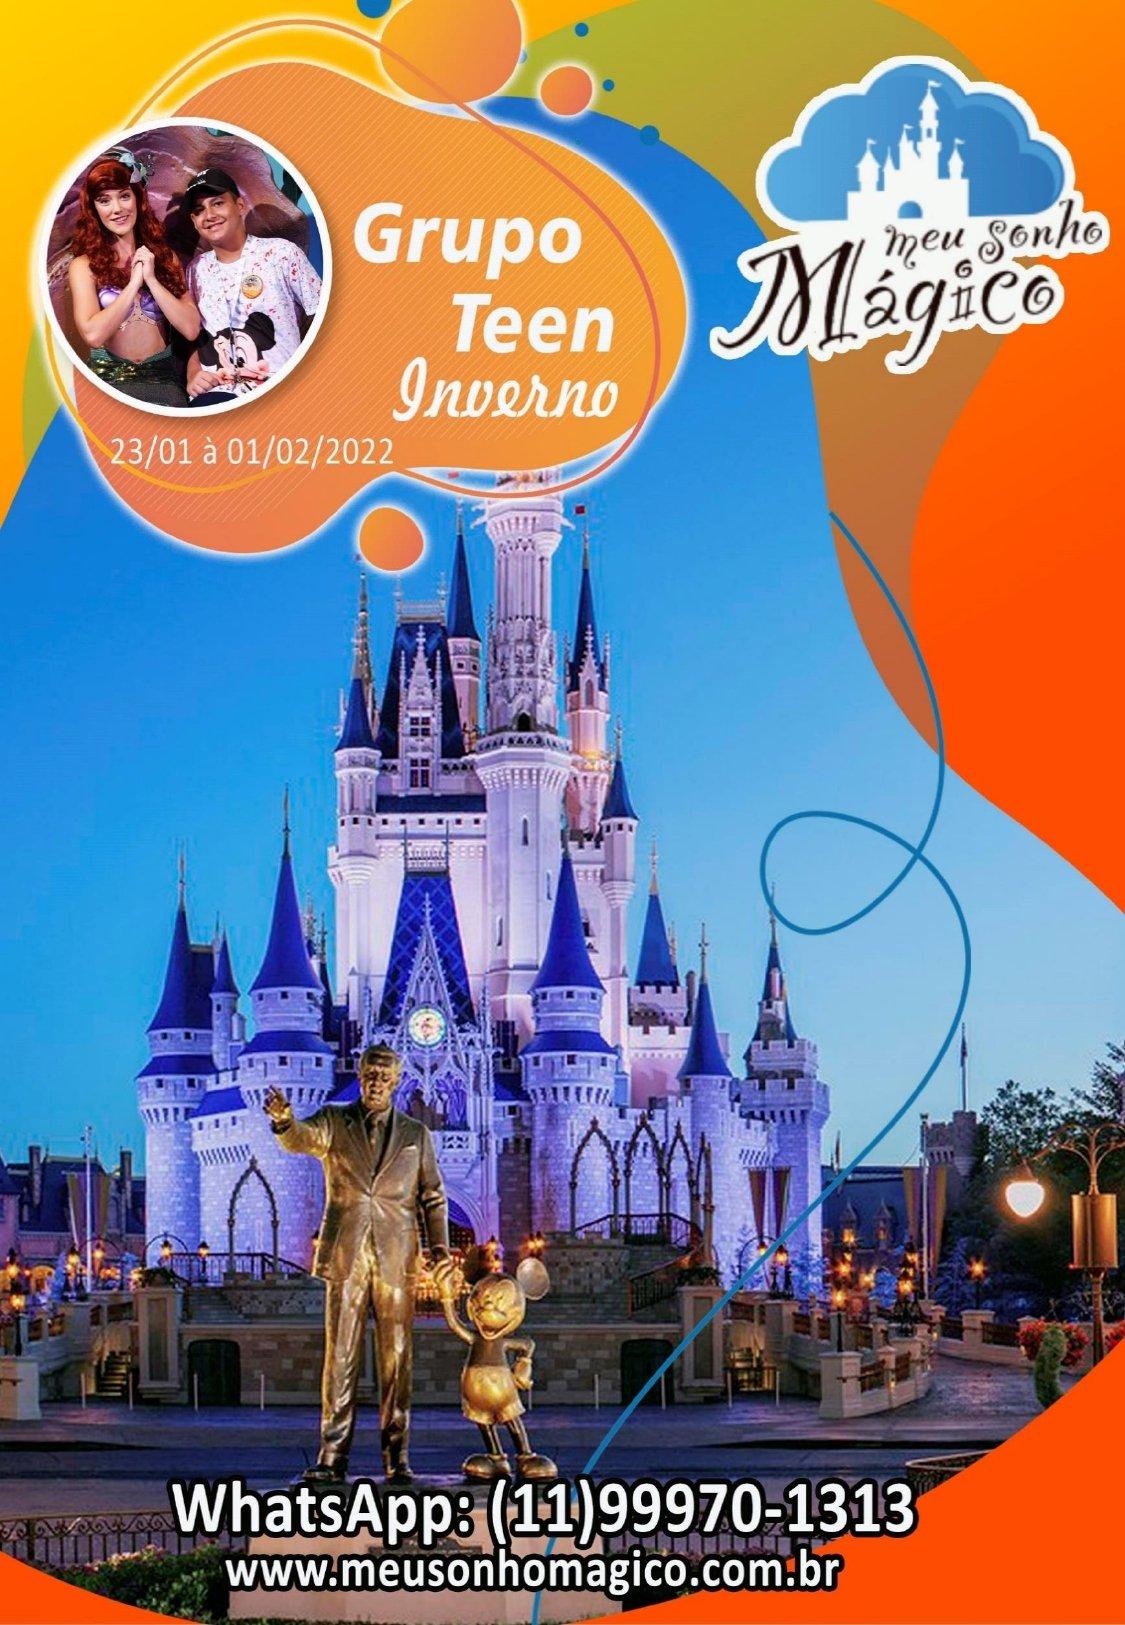 Grupo Teen Inverno - Disney Janeiro 2022 1